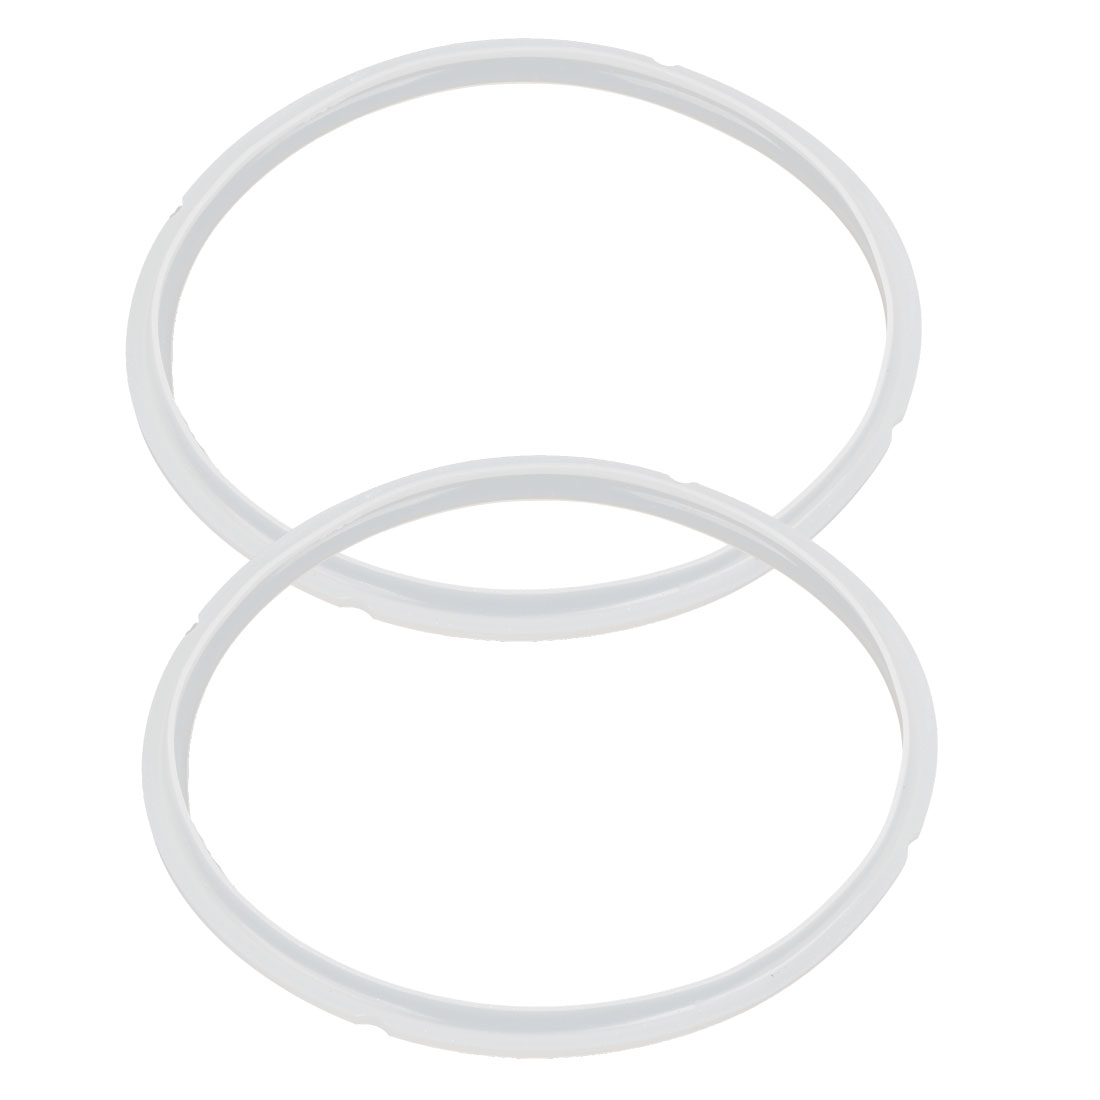 2 Pcs White 23cm Inner Diameter Gasket Sealing Ring for 7-8L Pressure Cookers